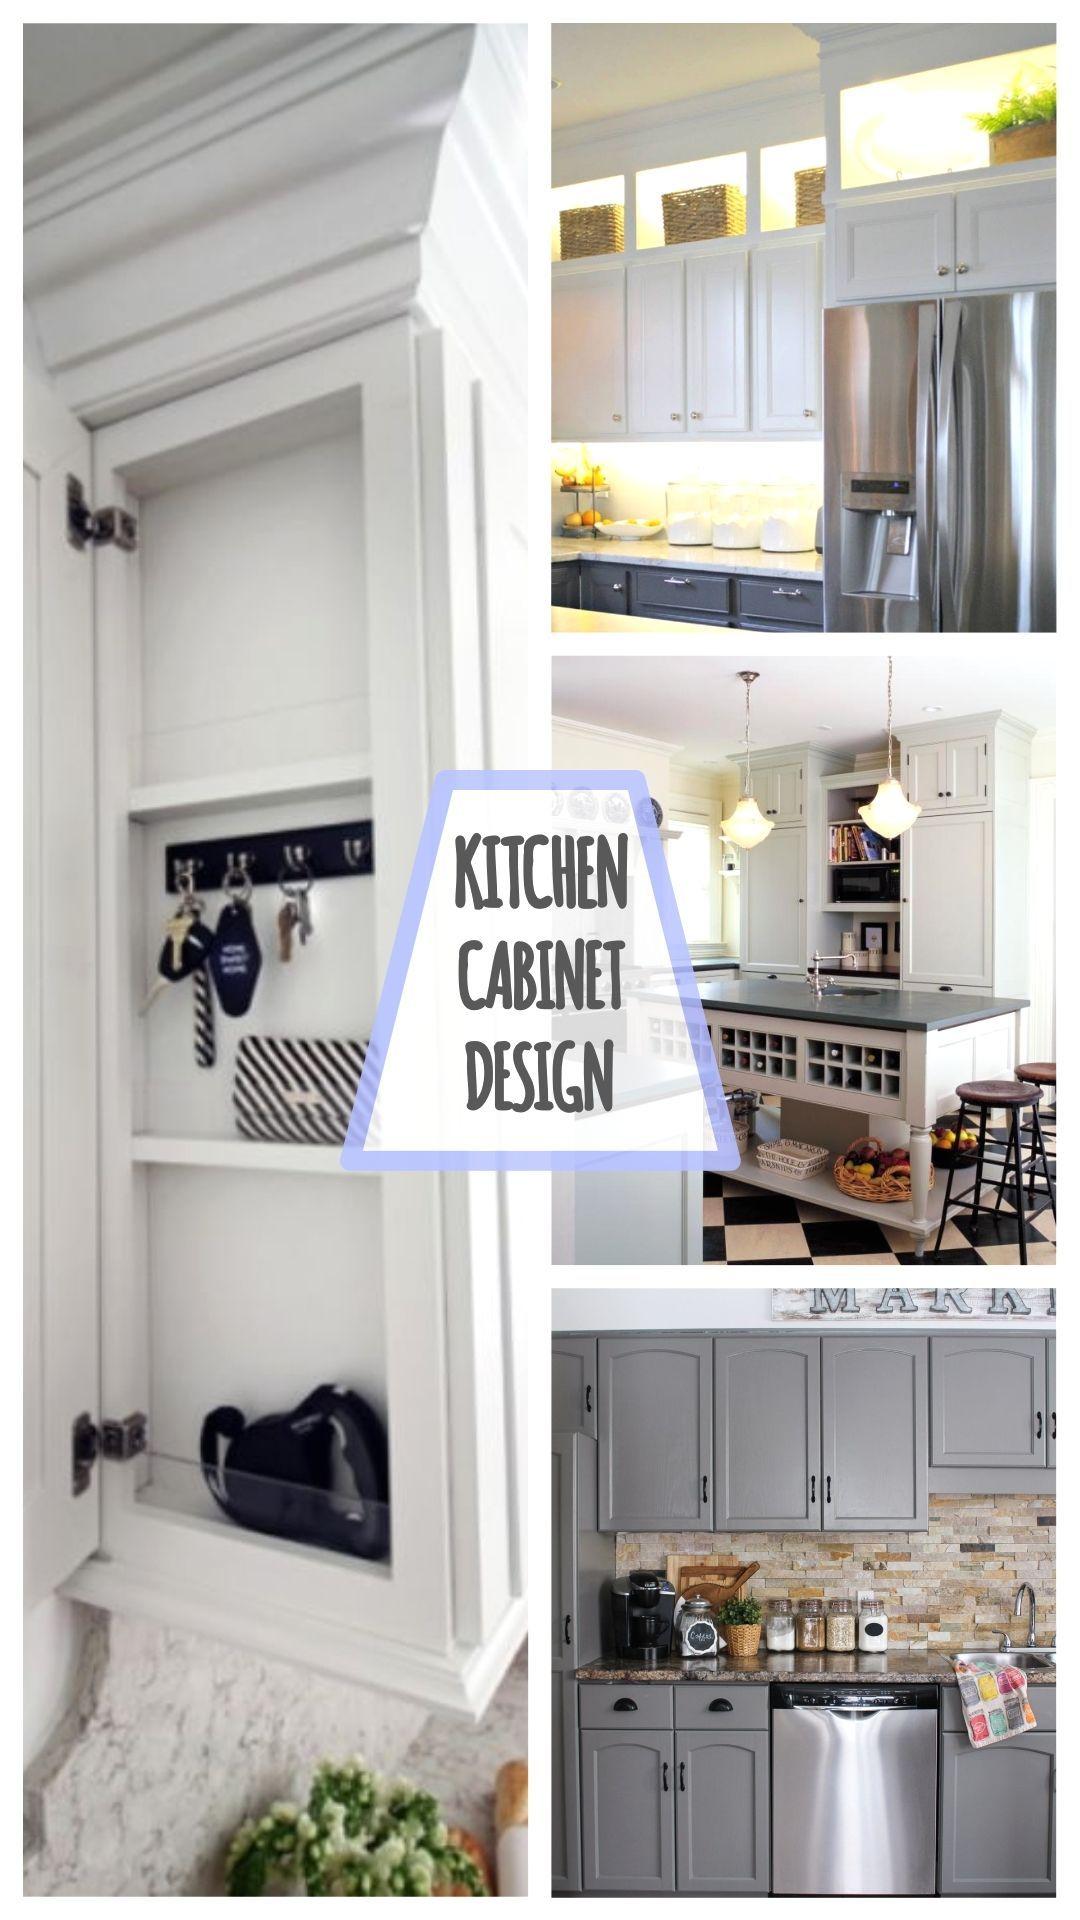 Cheap Boho Decor Saleprice 19 In 2020 Diy Kitchen Cabinets Kitchen Cabinets Kitchen Cabinet Inspiration